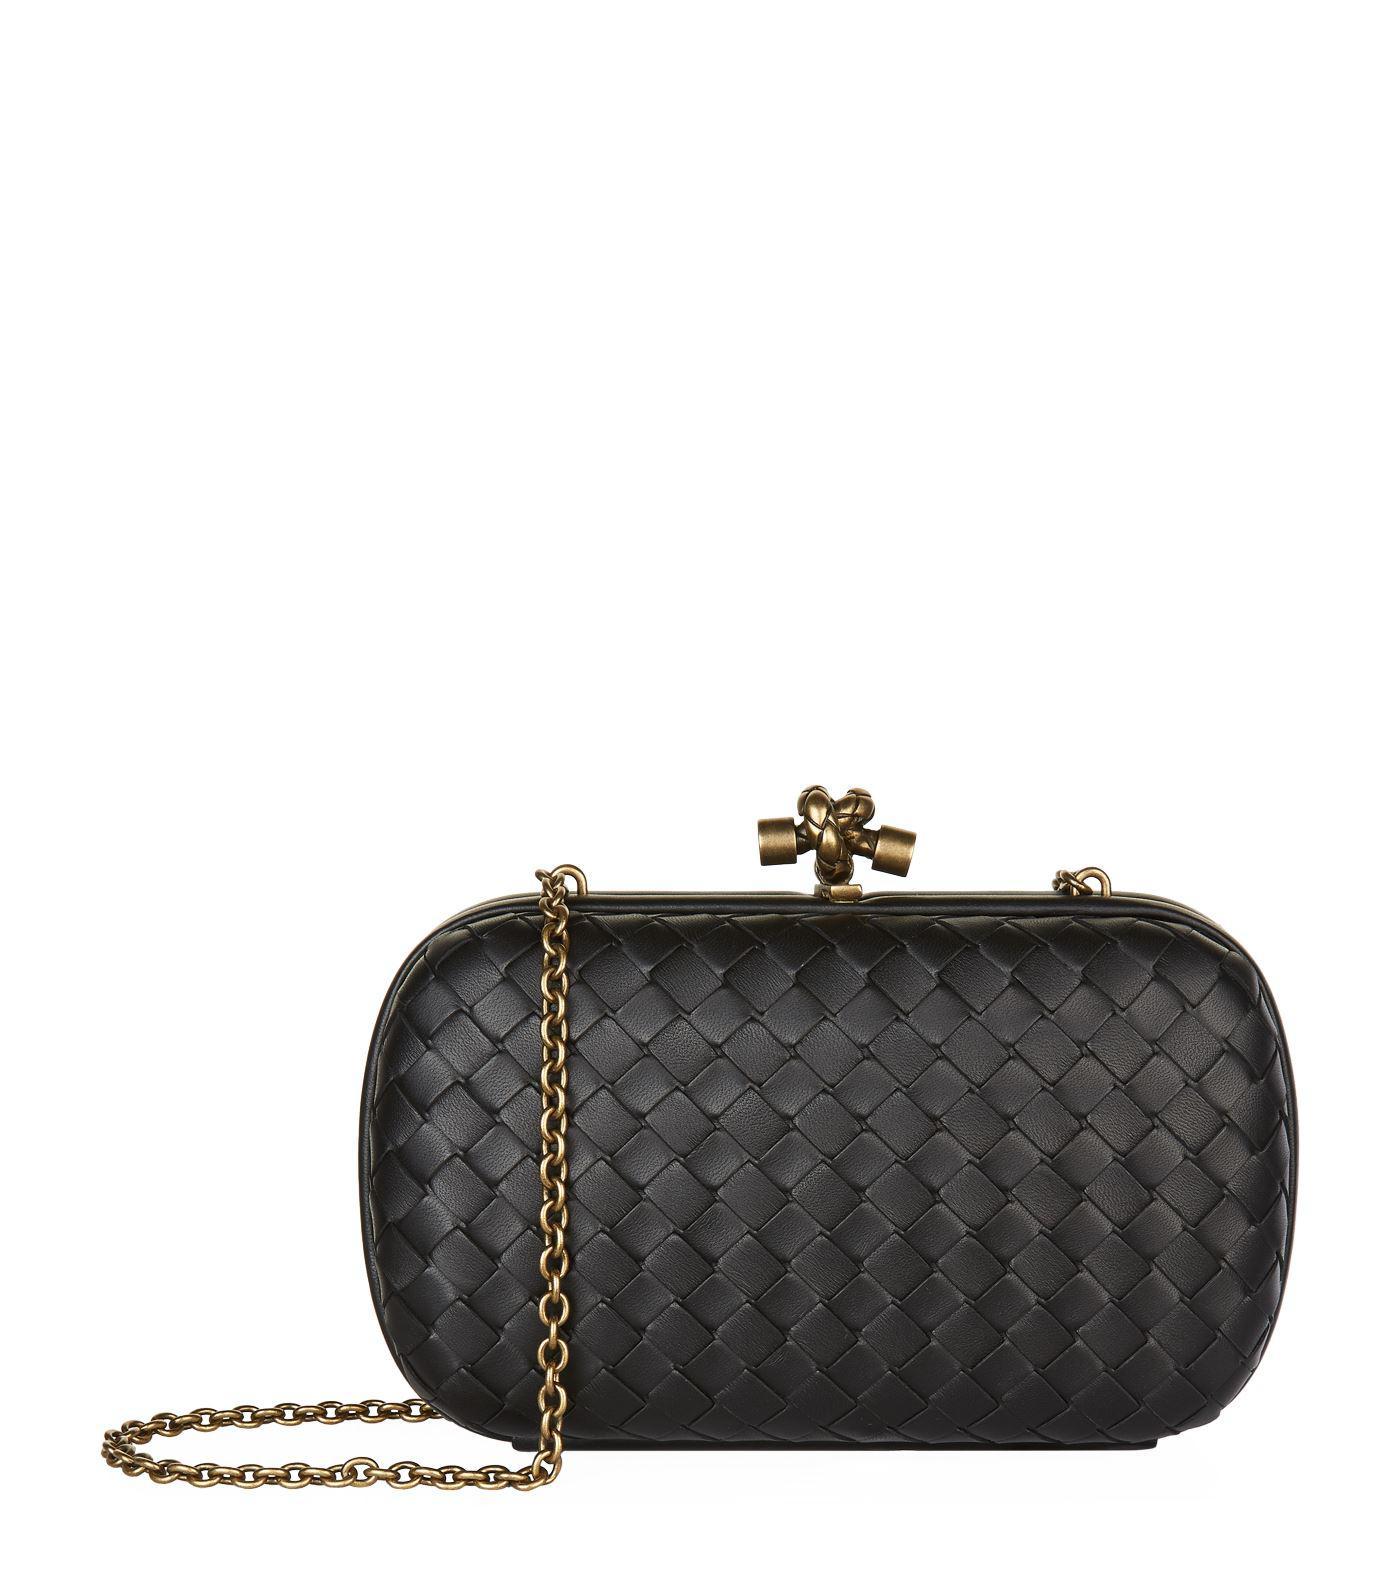 3b8de60db3f0 Bottega Veneta Leather Knot Clutch Bag in Black - Lyst